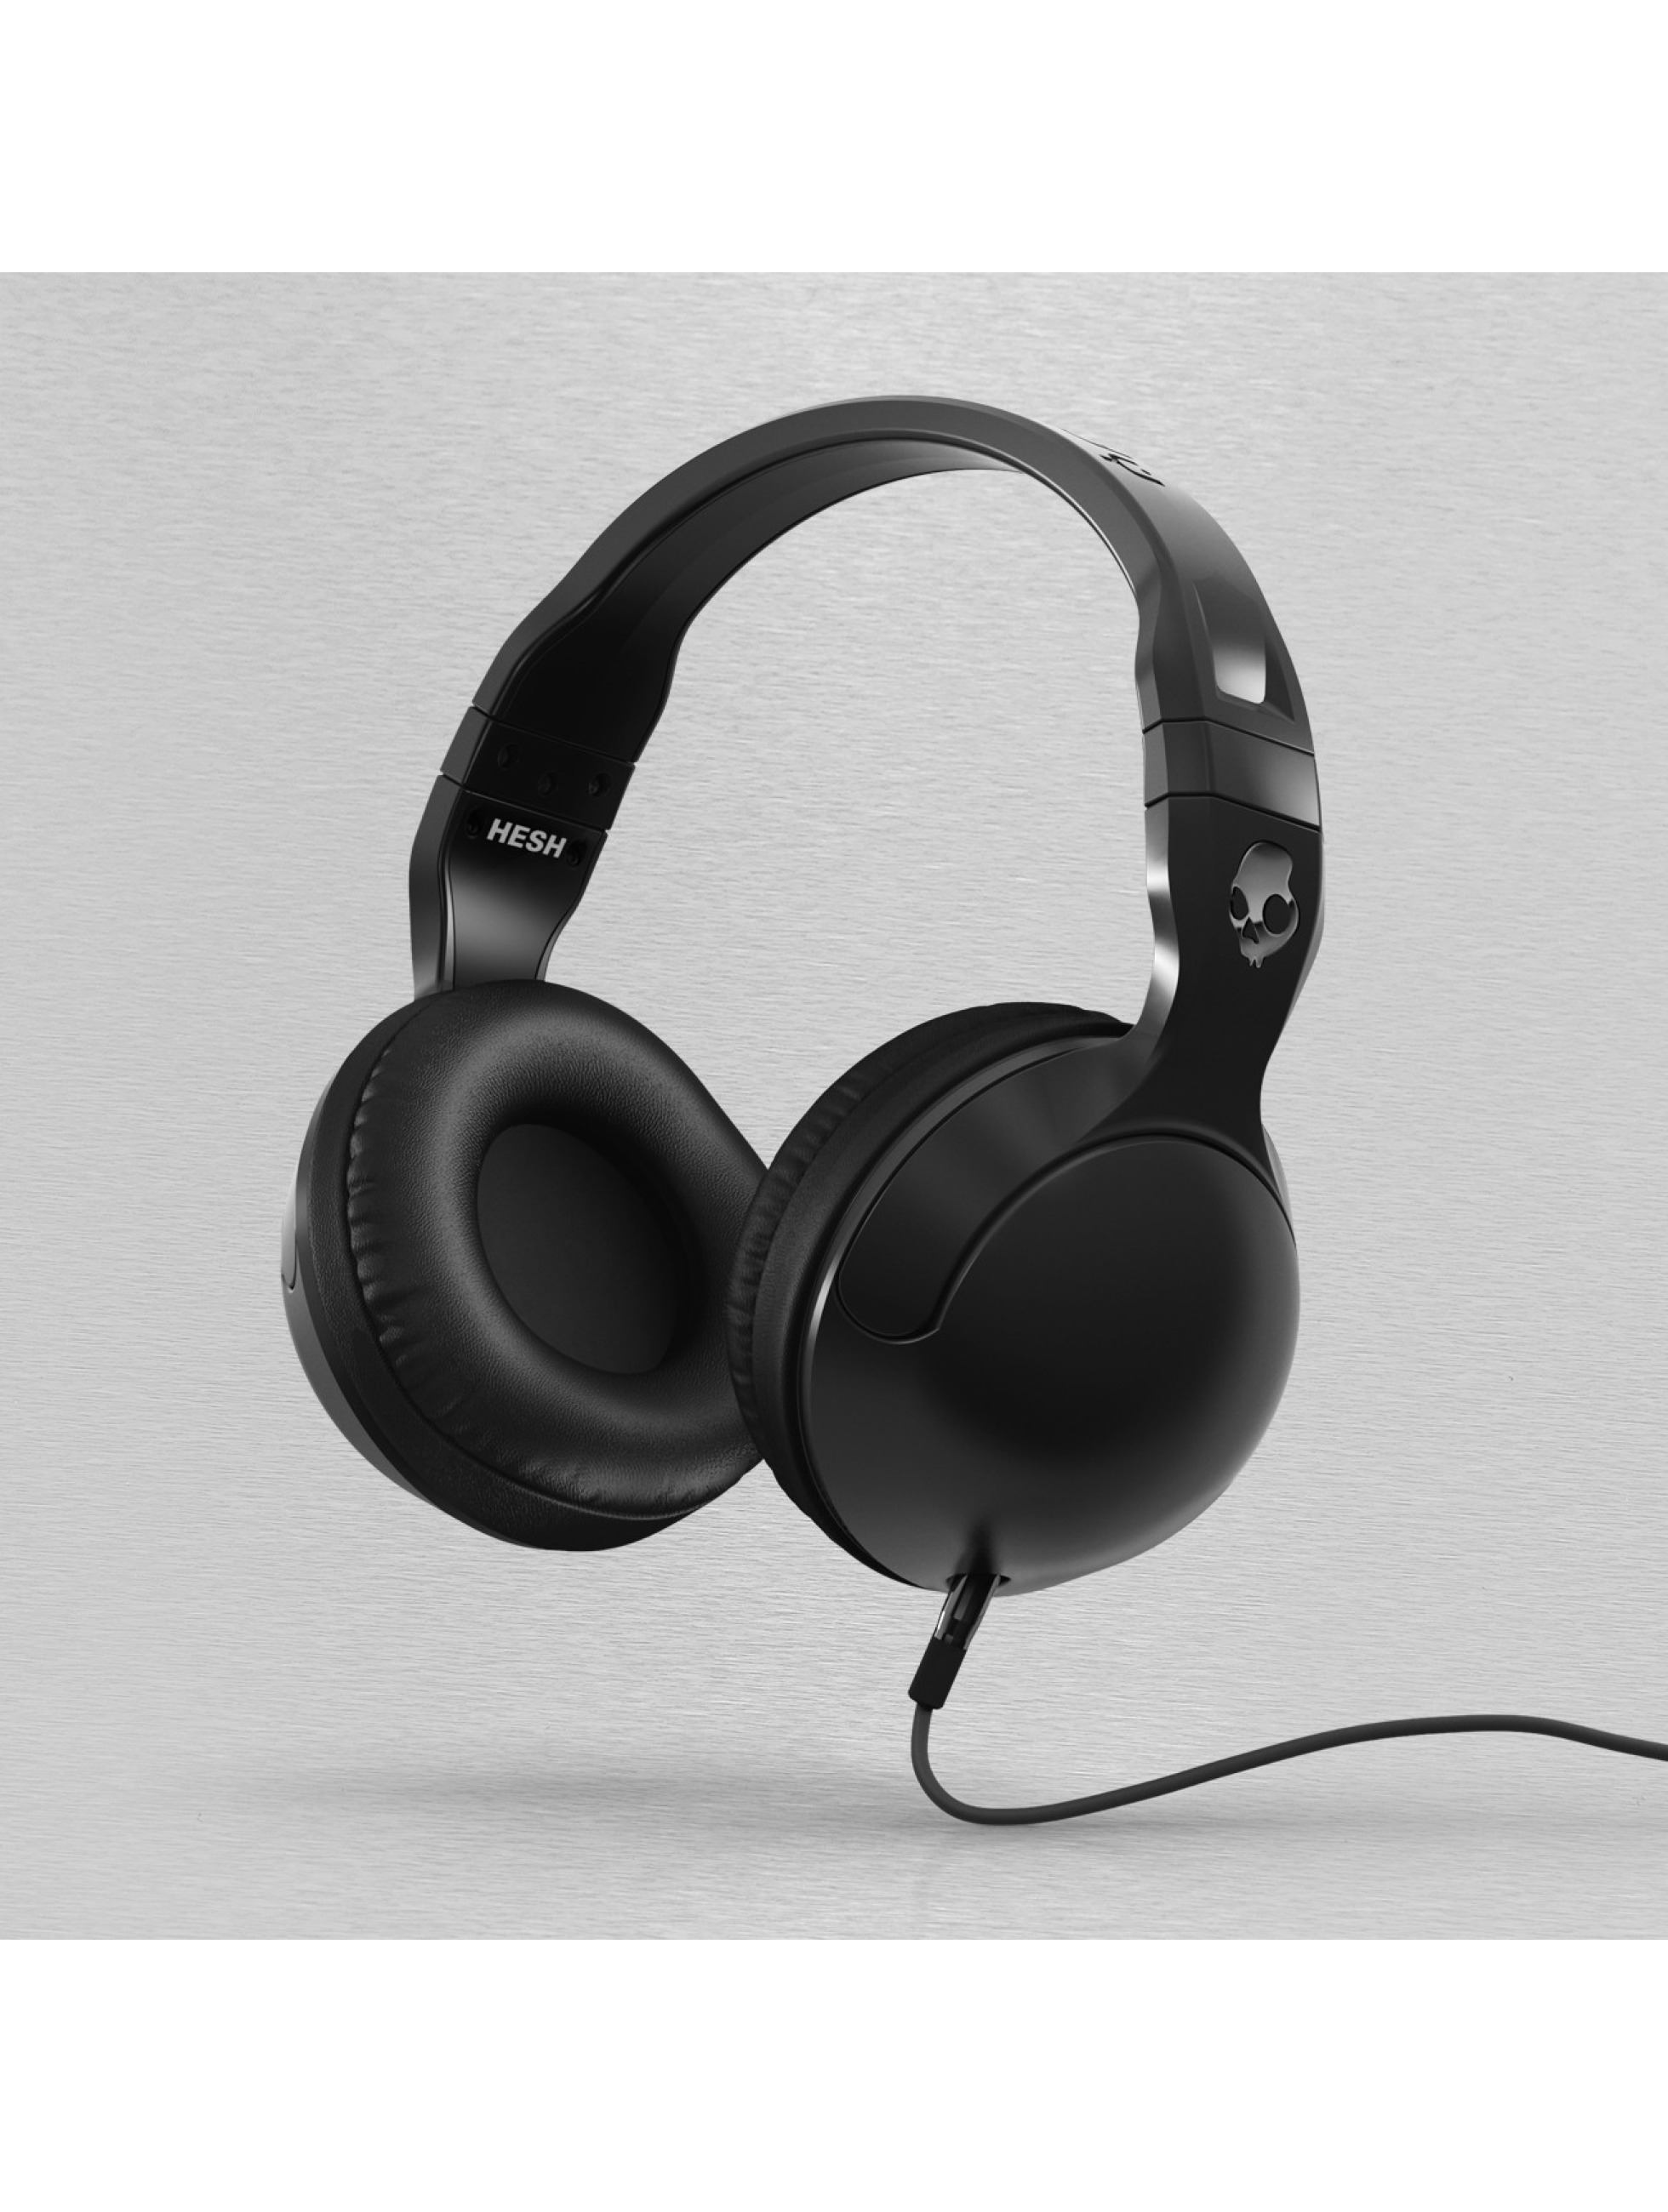 Skullcandy accessoires casque audio hesh 2 mic1 en noir - Porte casque audio ...